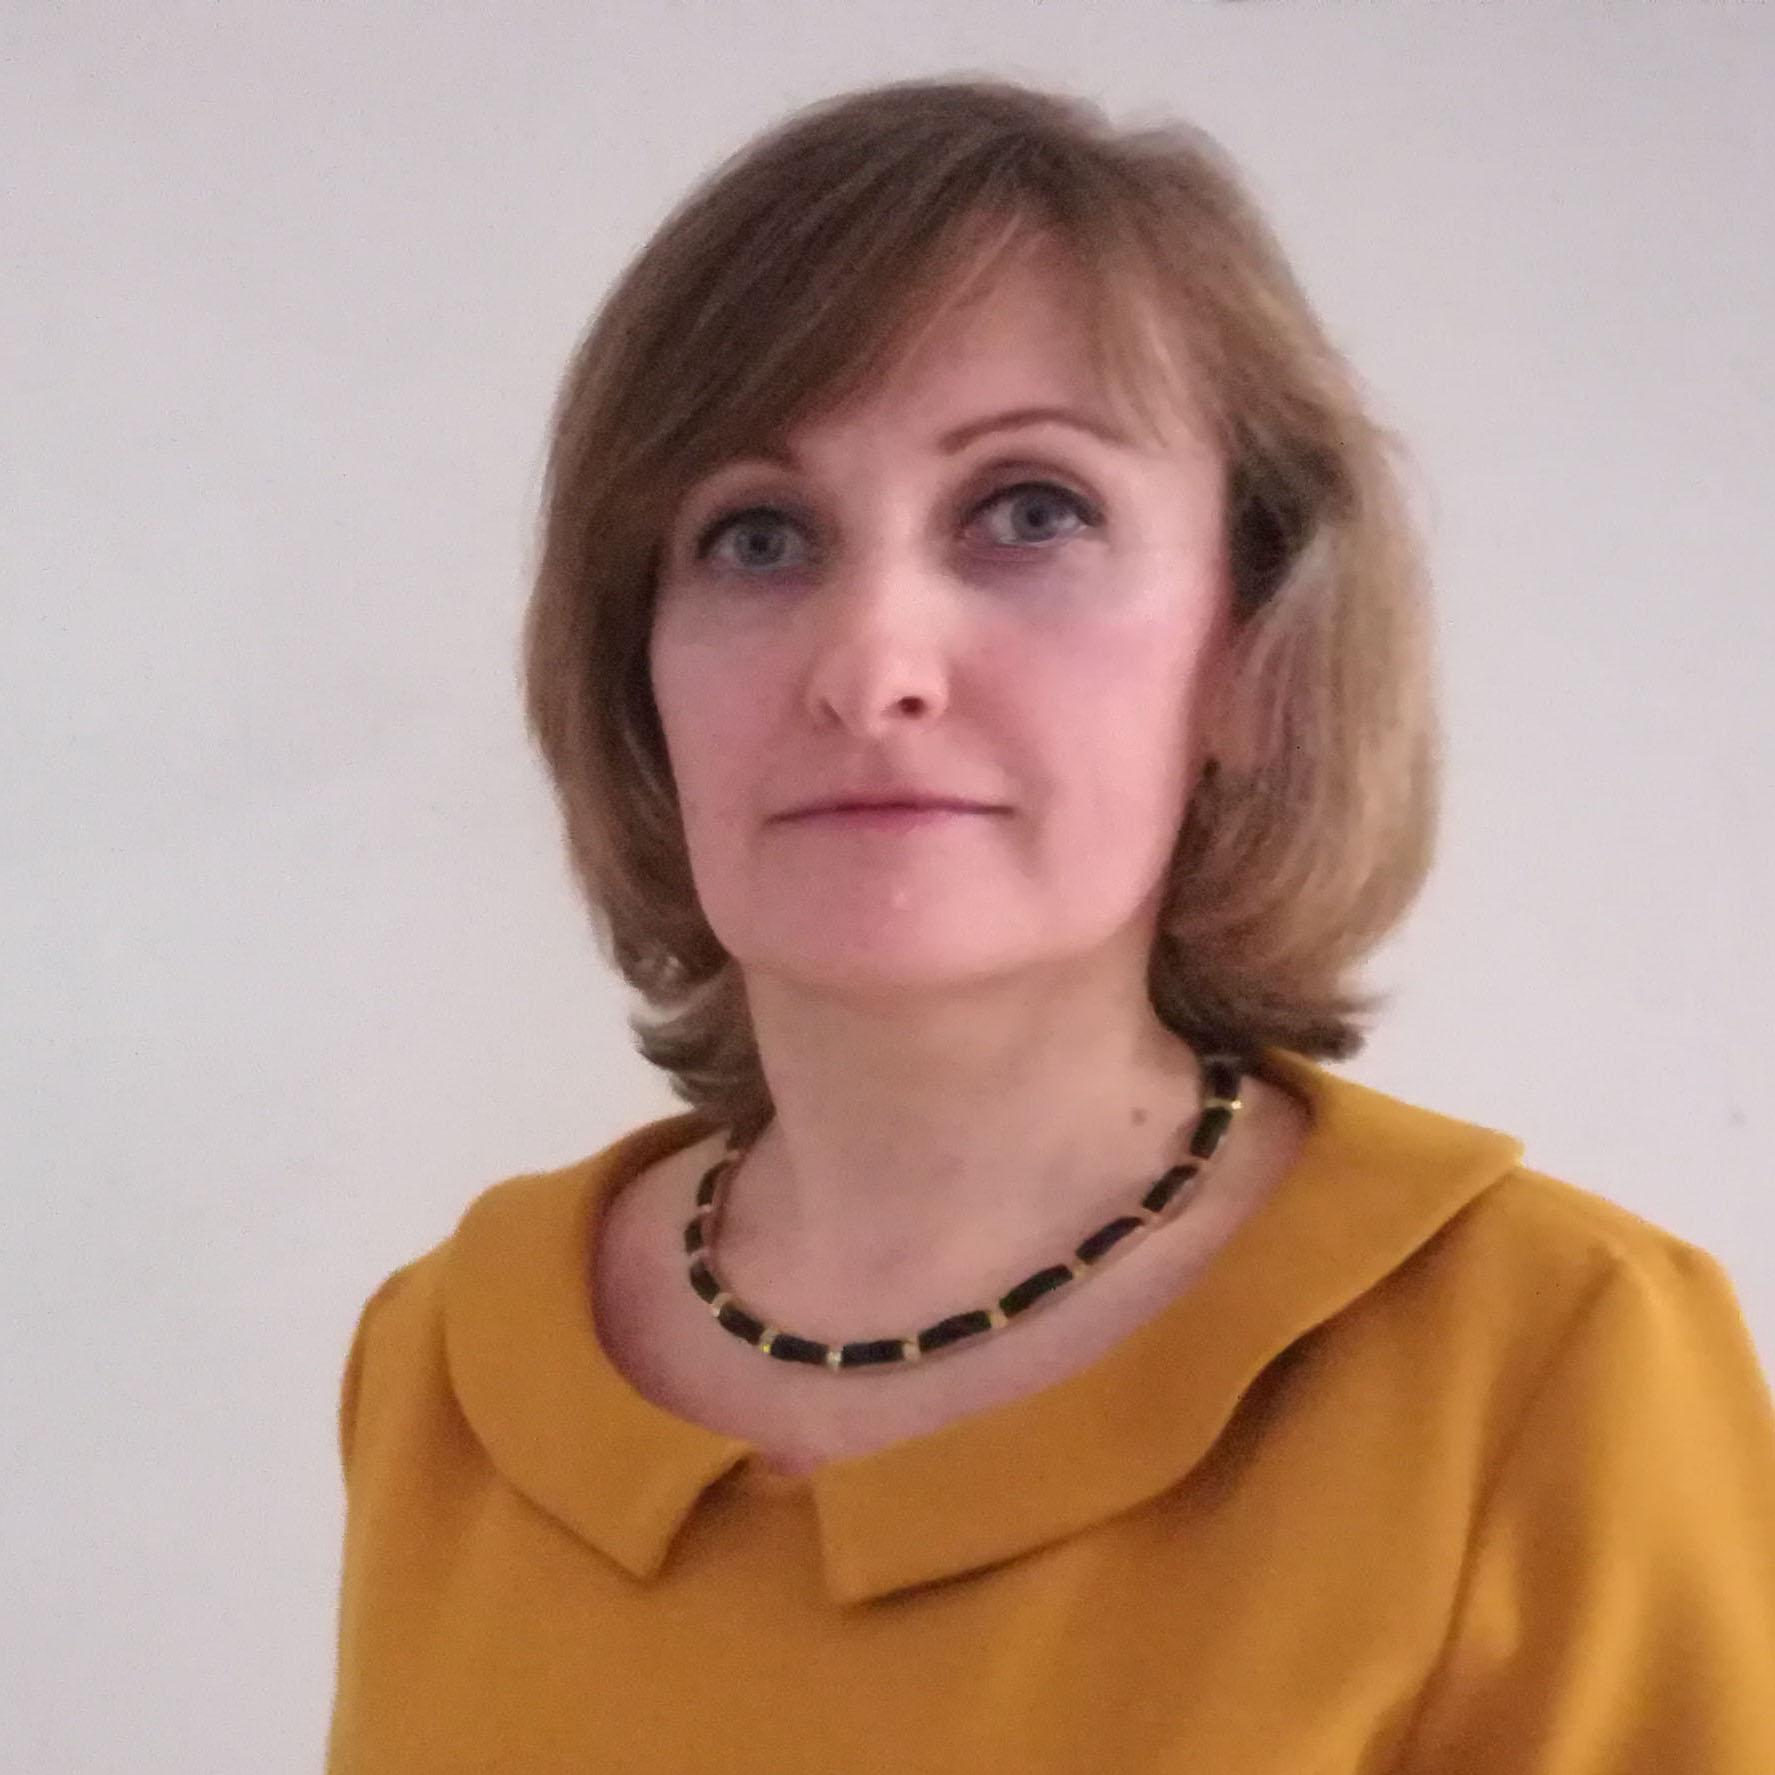 Мальшакова Ирина Леонидовна